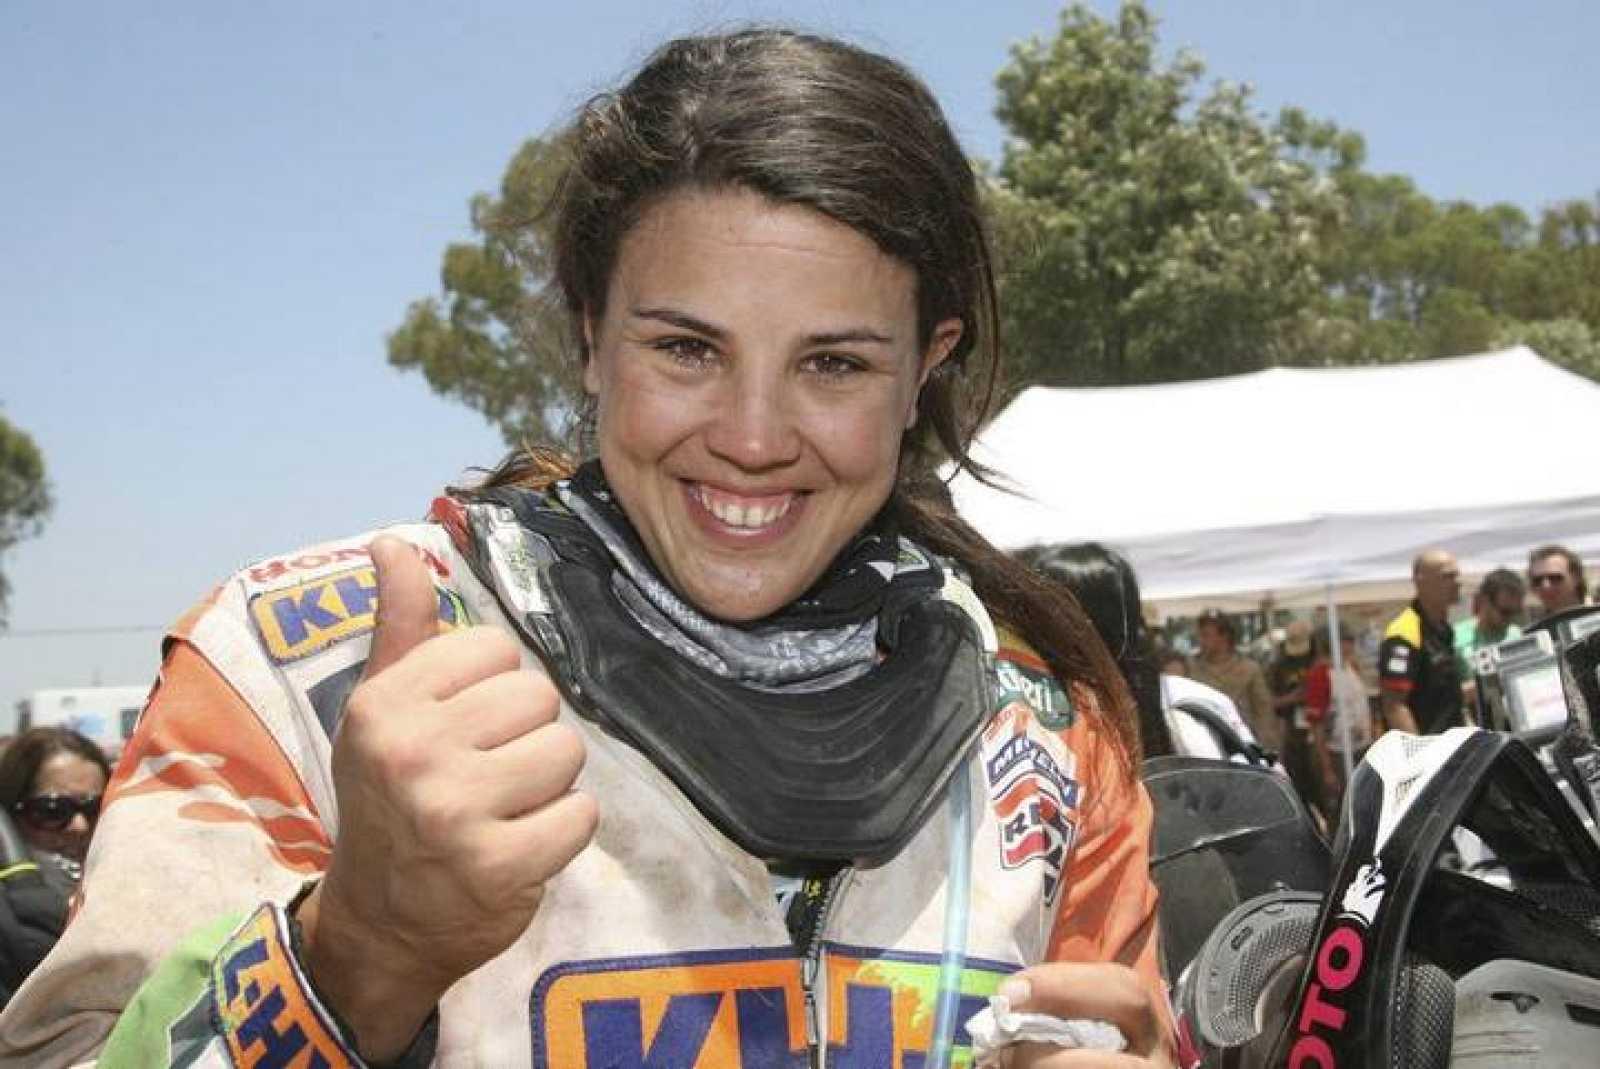 Motor rally dakar 2014 laia sanz afronta su cuarto - Tableros sanz madrid ...